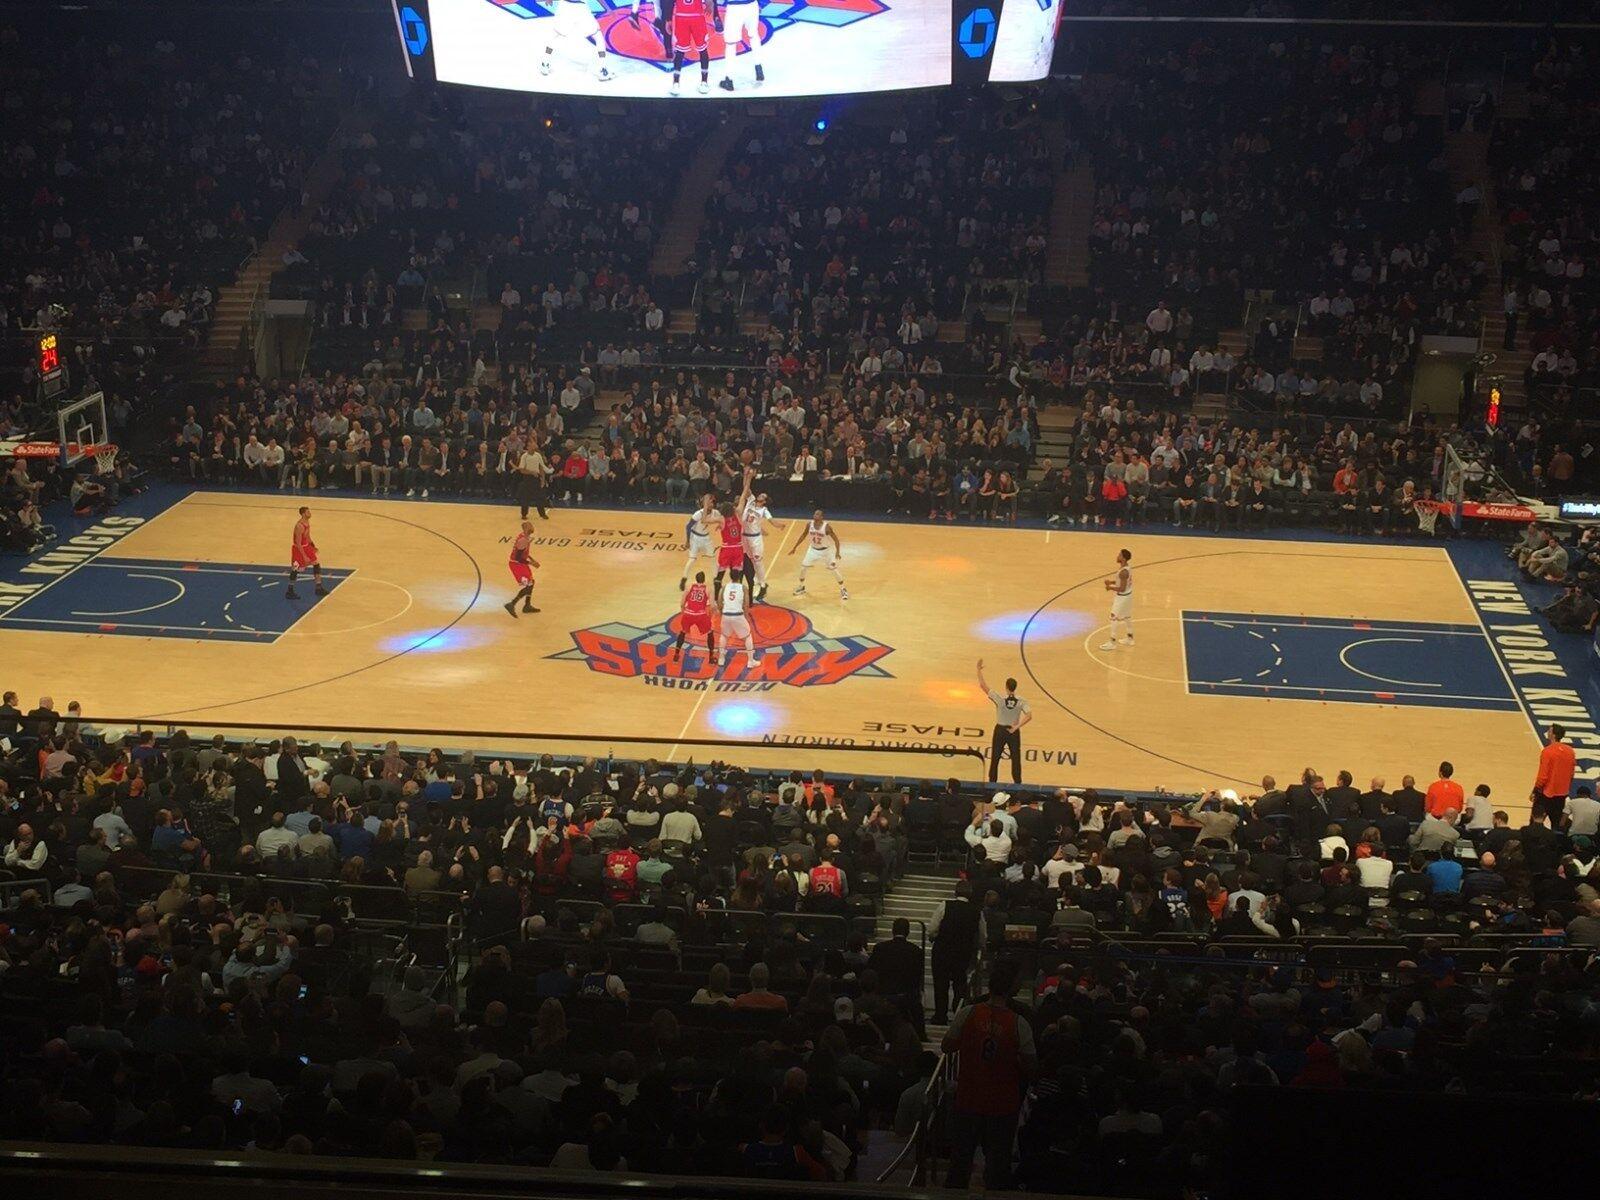 Купить 1/30/19 - 2 tickets - KNICKS/Mavericks, Sec 212, row 3 on aisle, center court